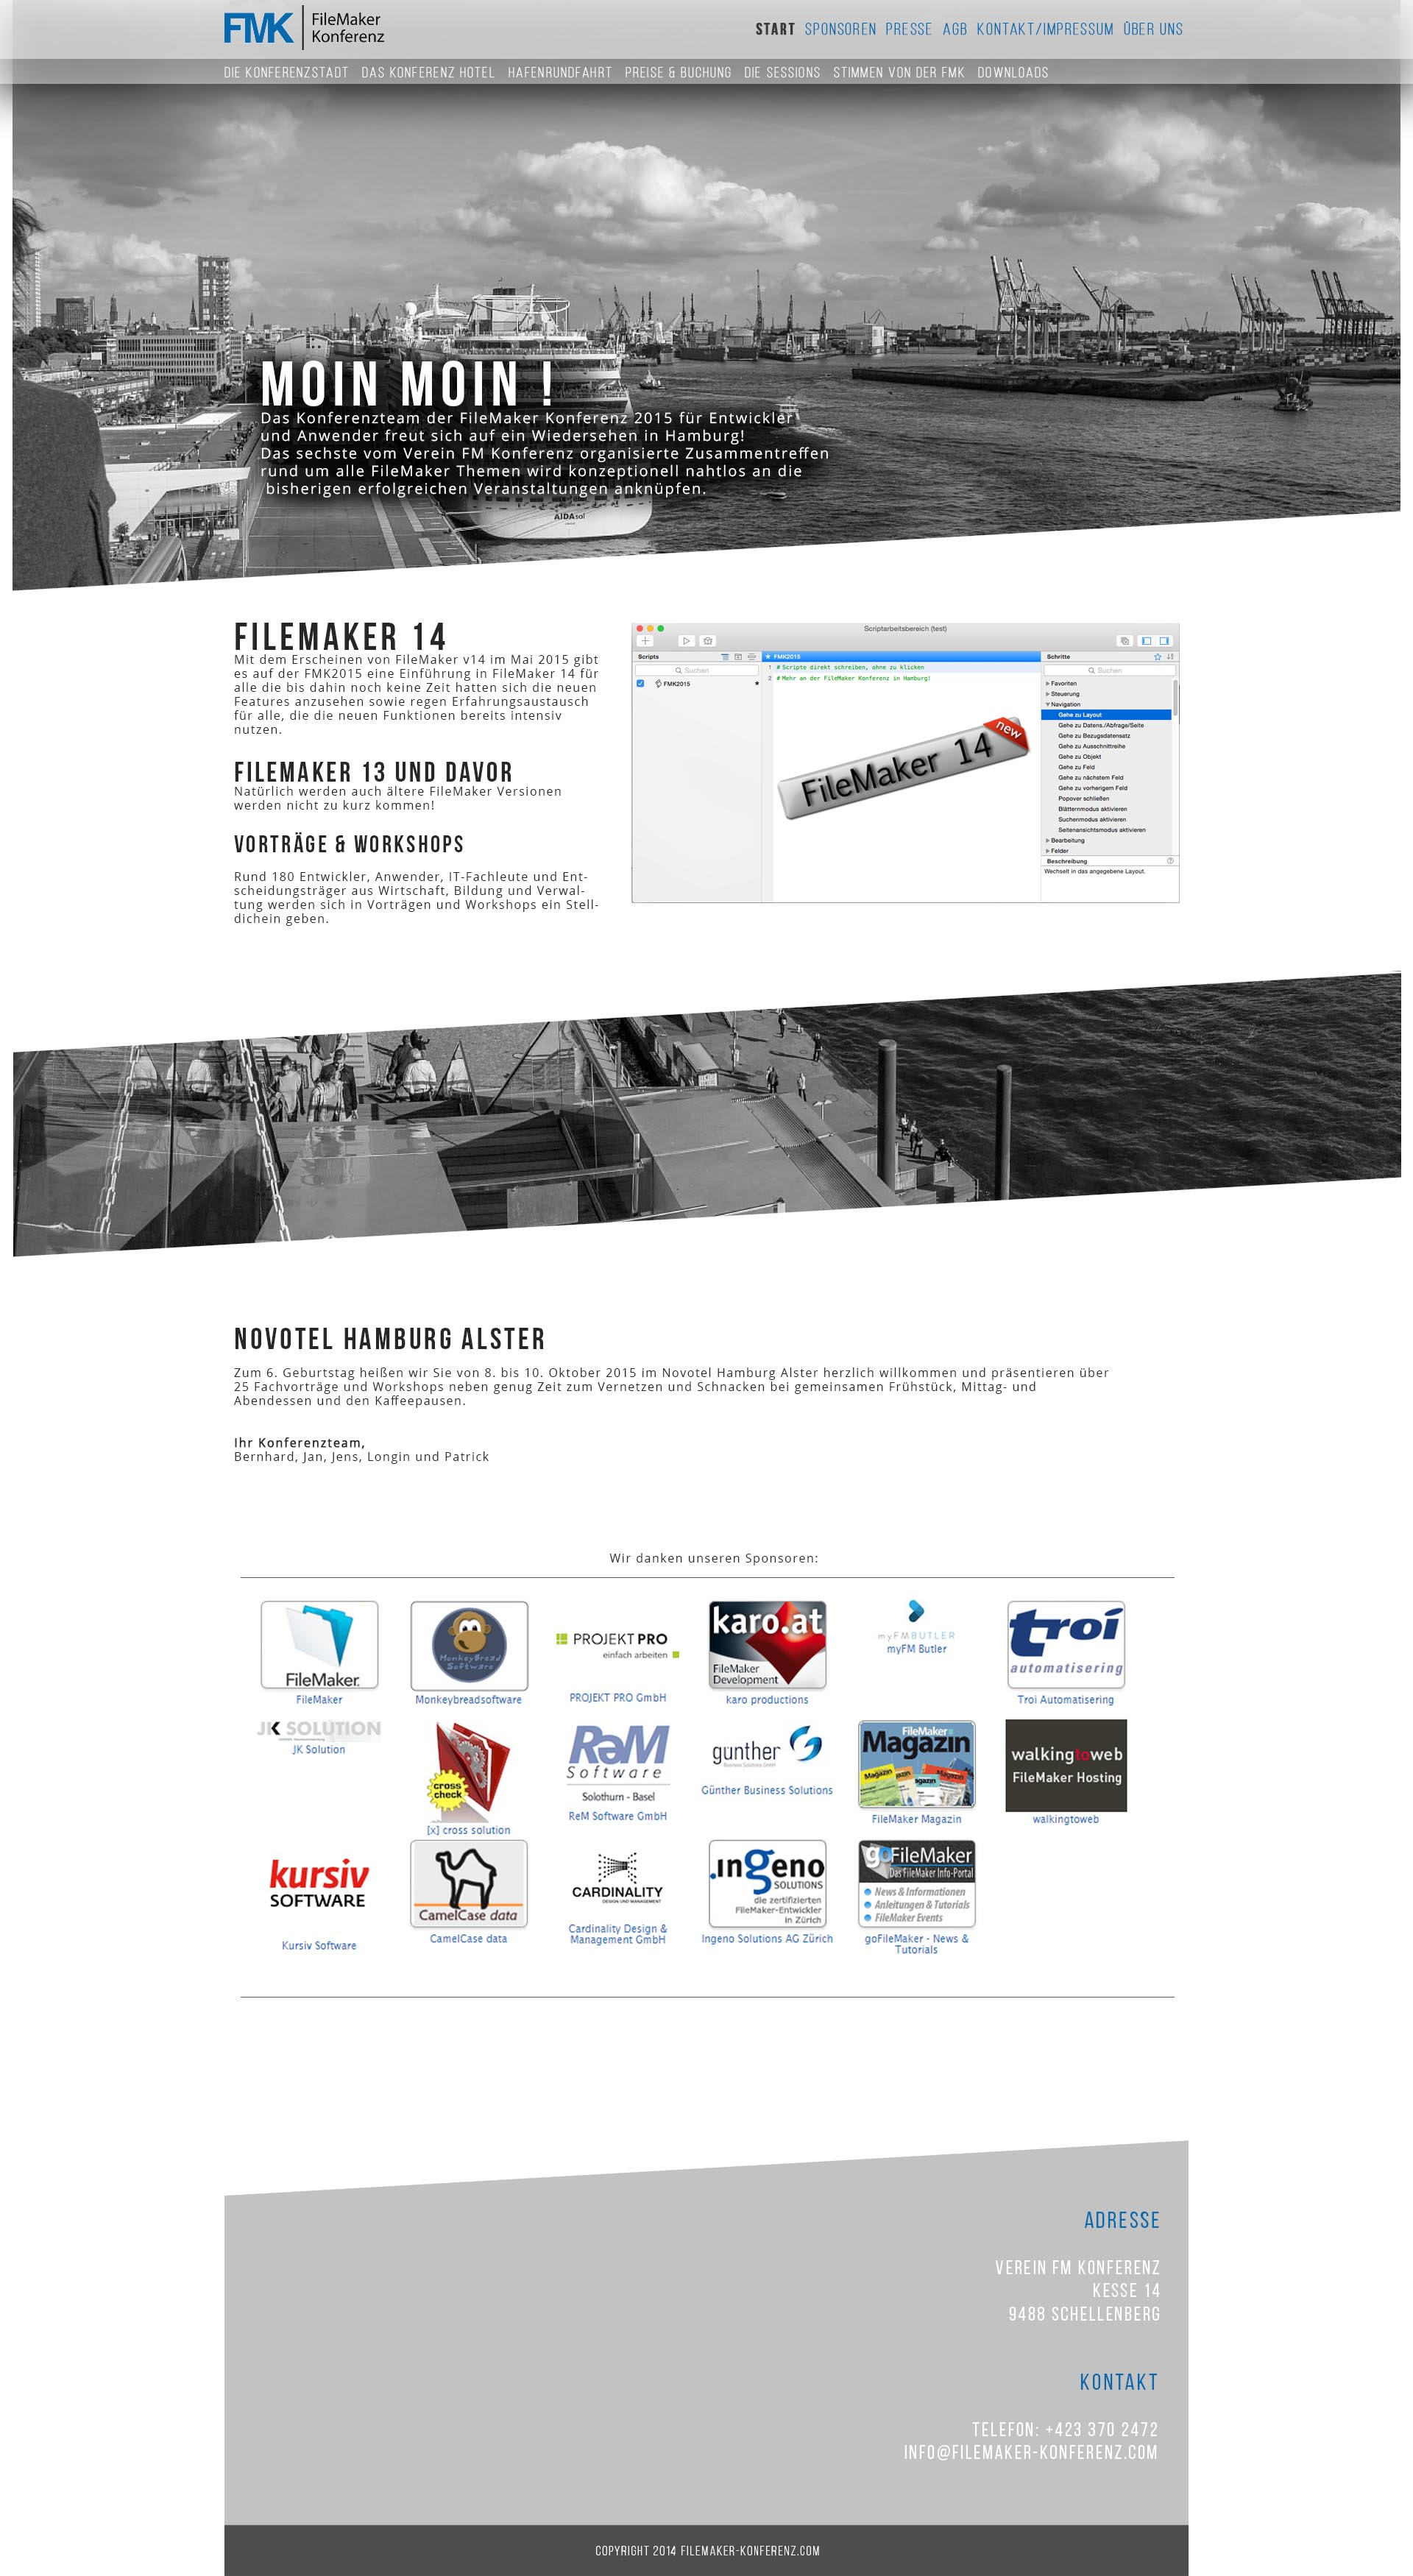 Verein FM Konferenz » Webdesign » designonclick com